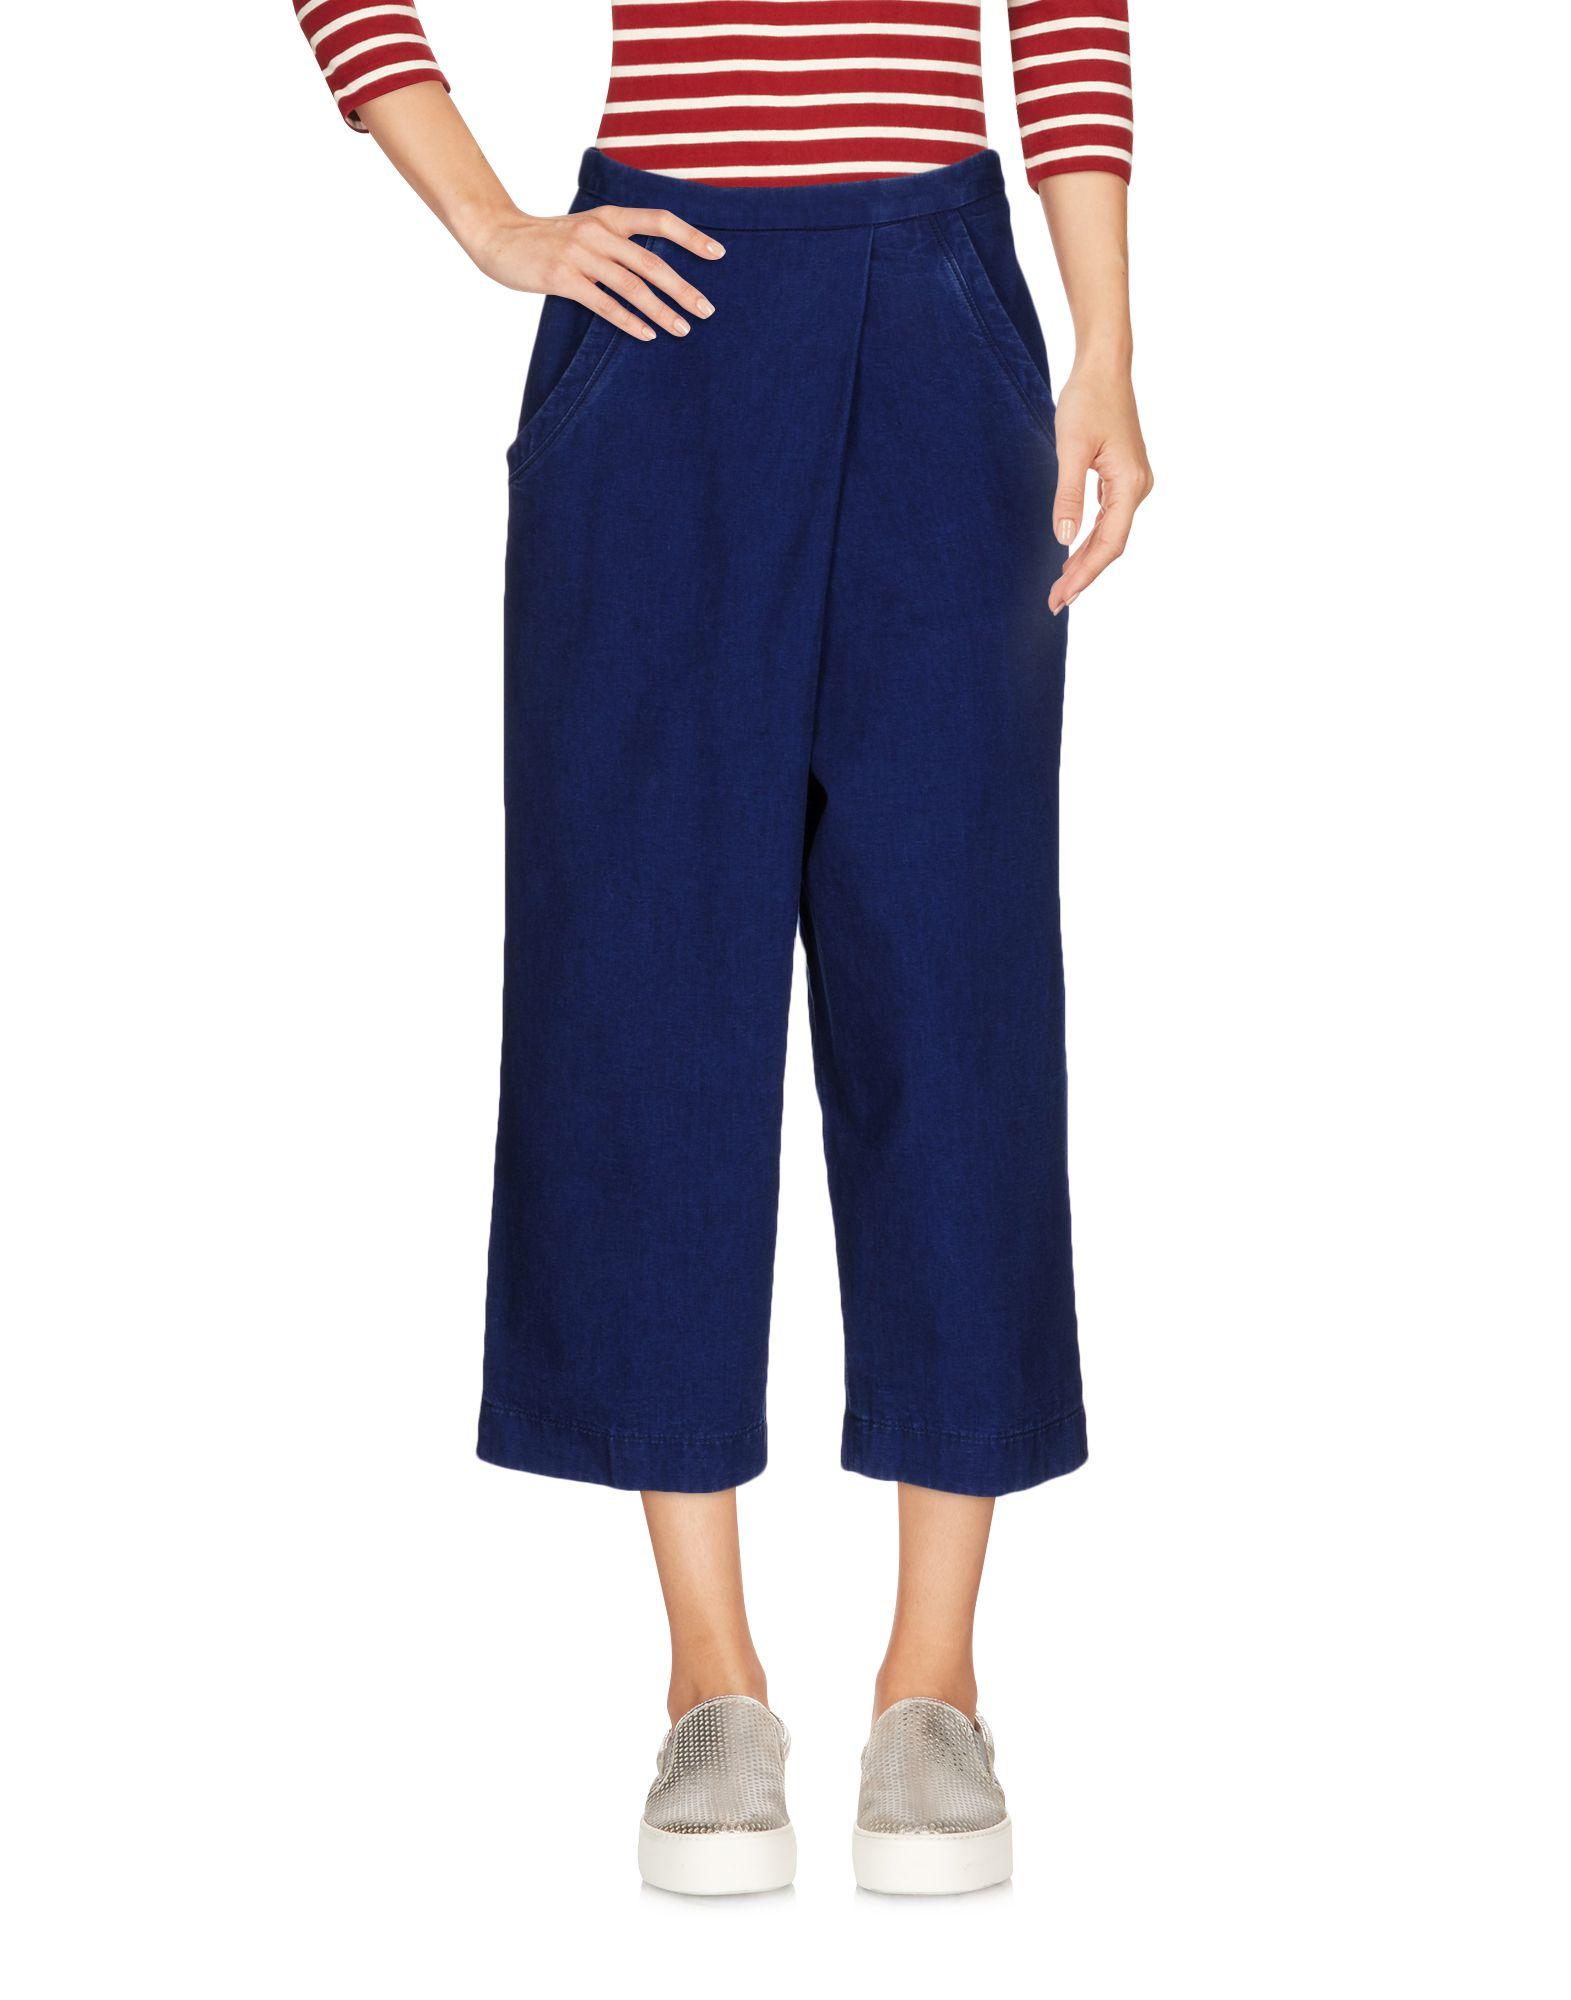 цена PENCE Джинсовые брюки-капри онлайн в 2017 году